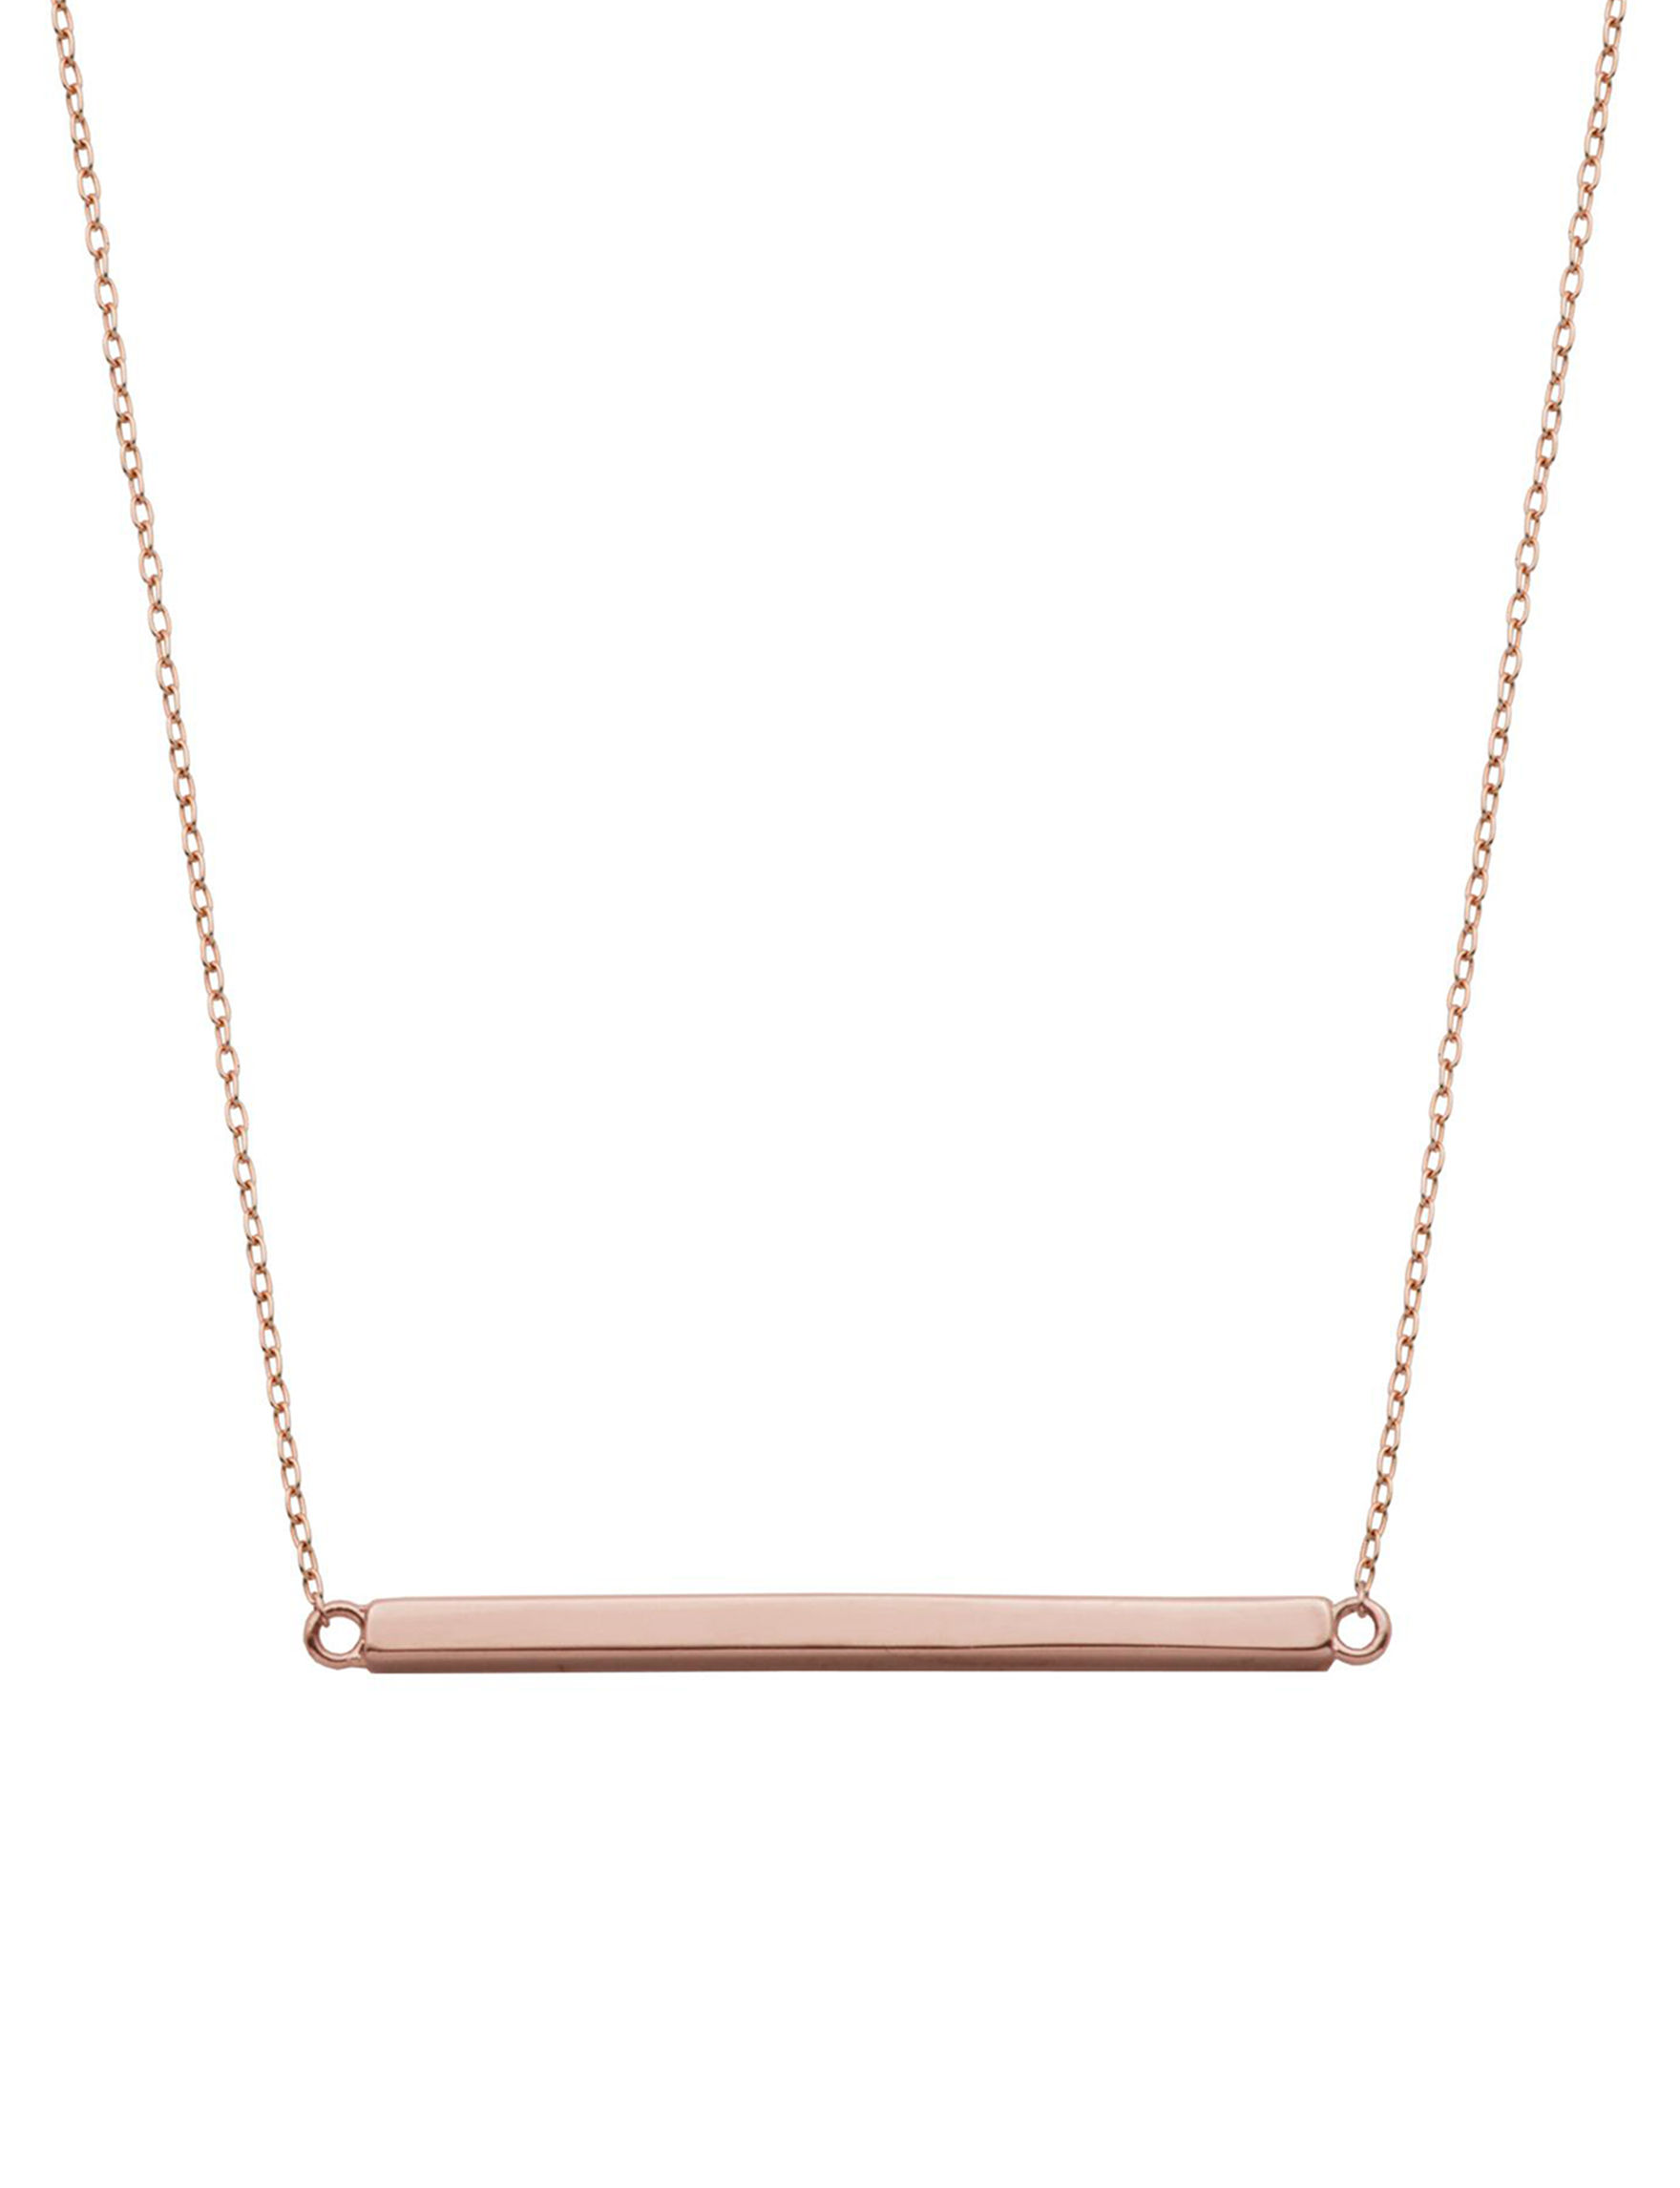 PAJ INC. Rose Gold Necklaces & Pendants Fine Jewelry